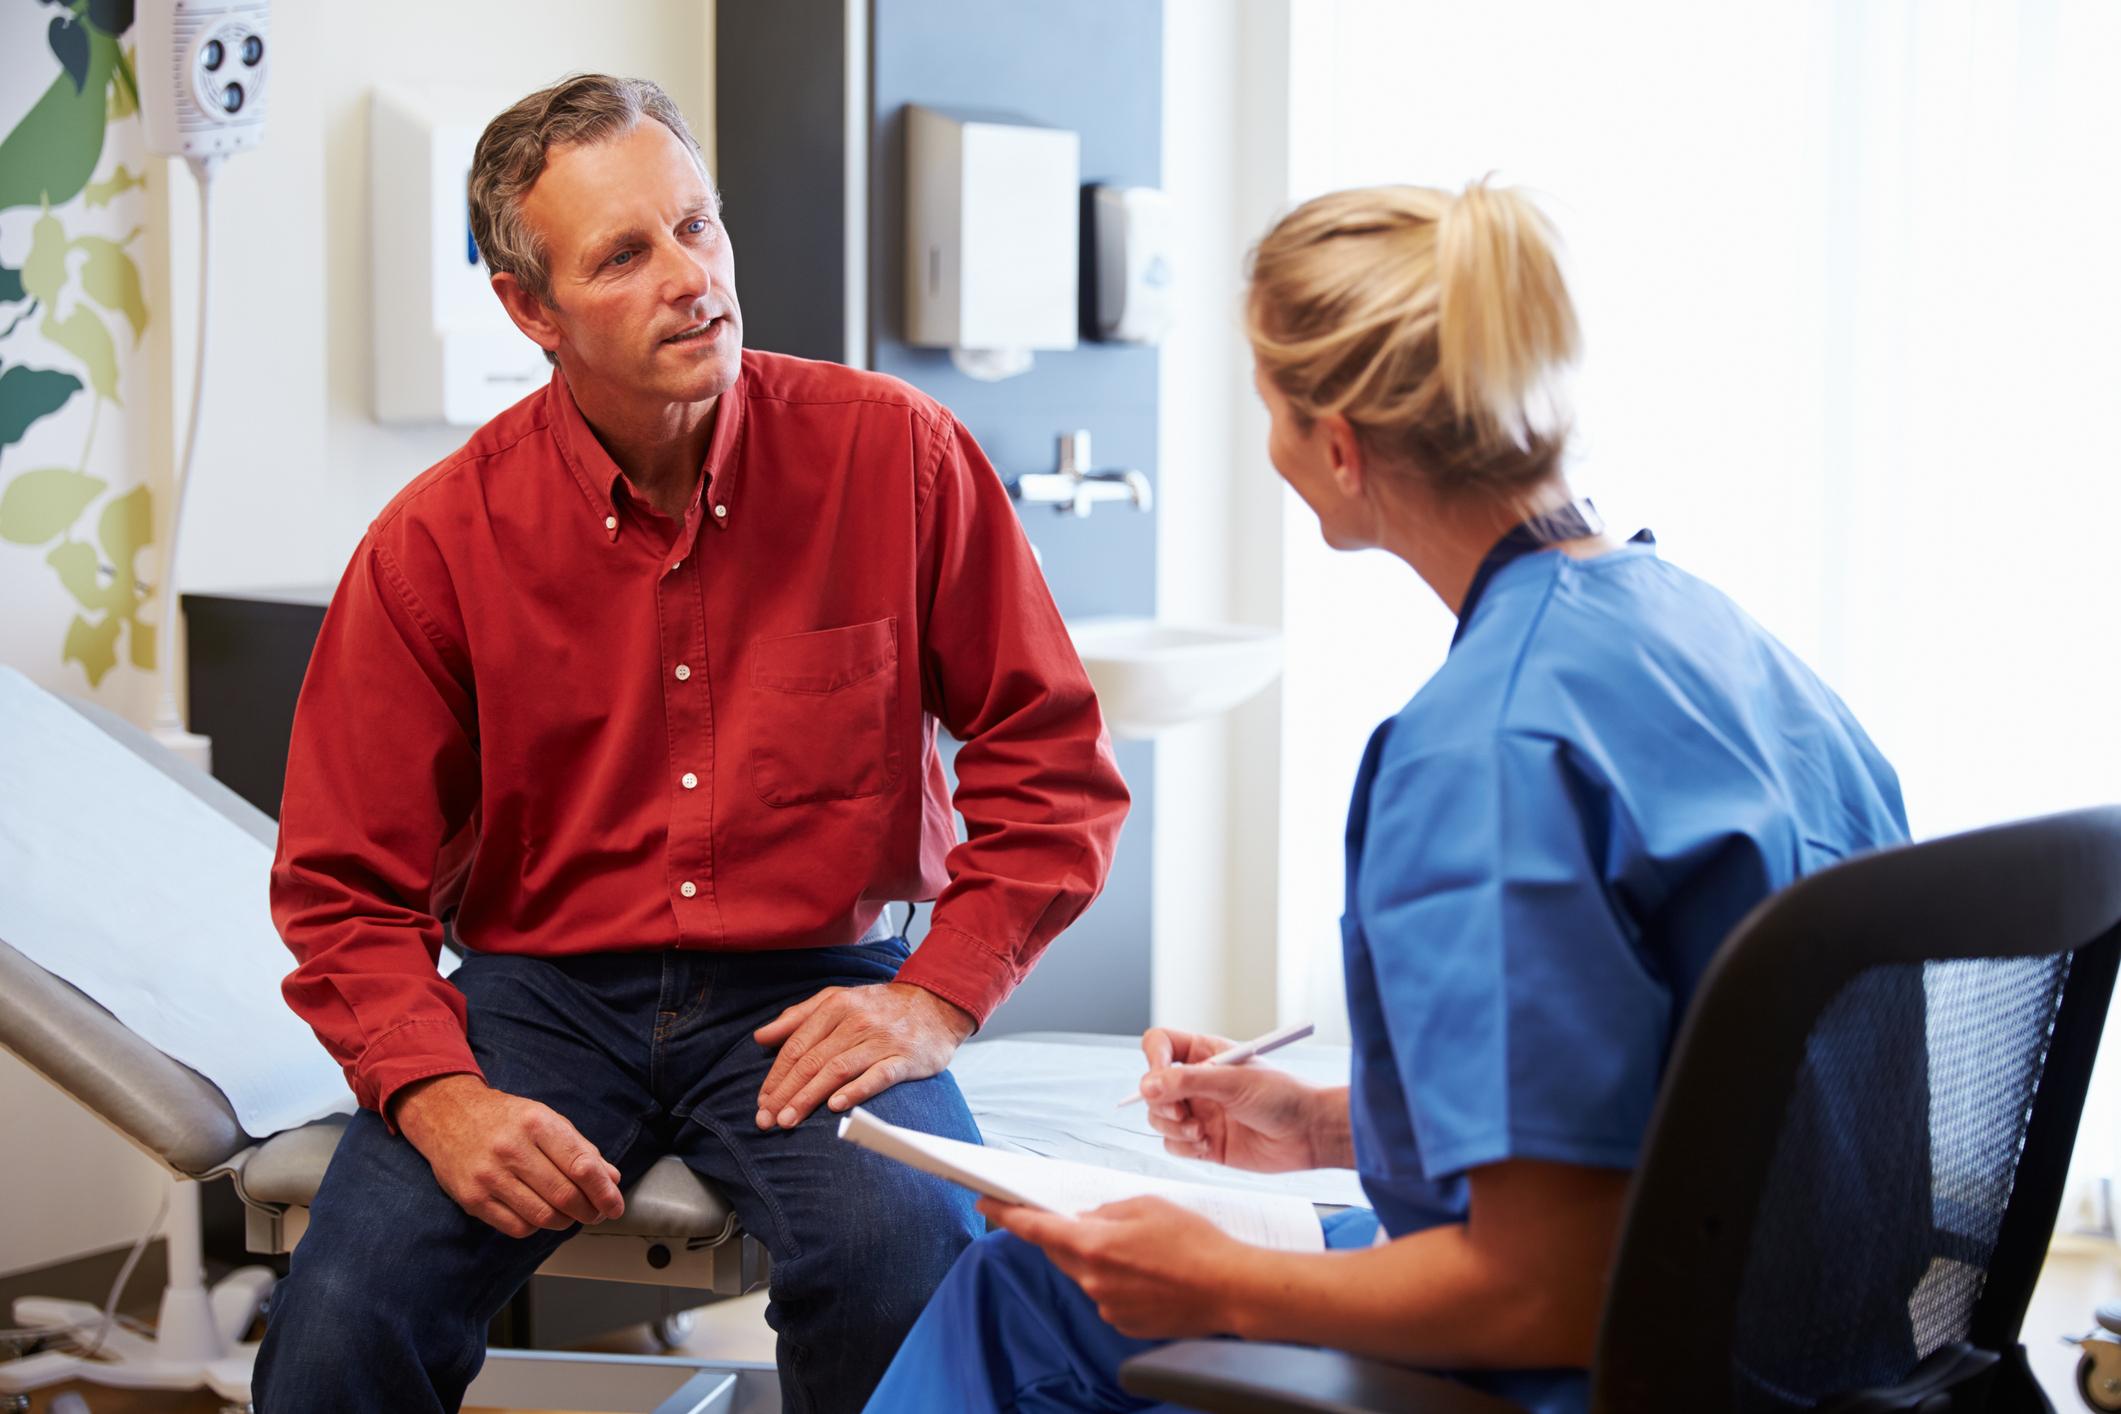 Doctor taking to patient in exam room